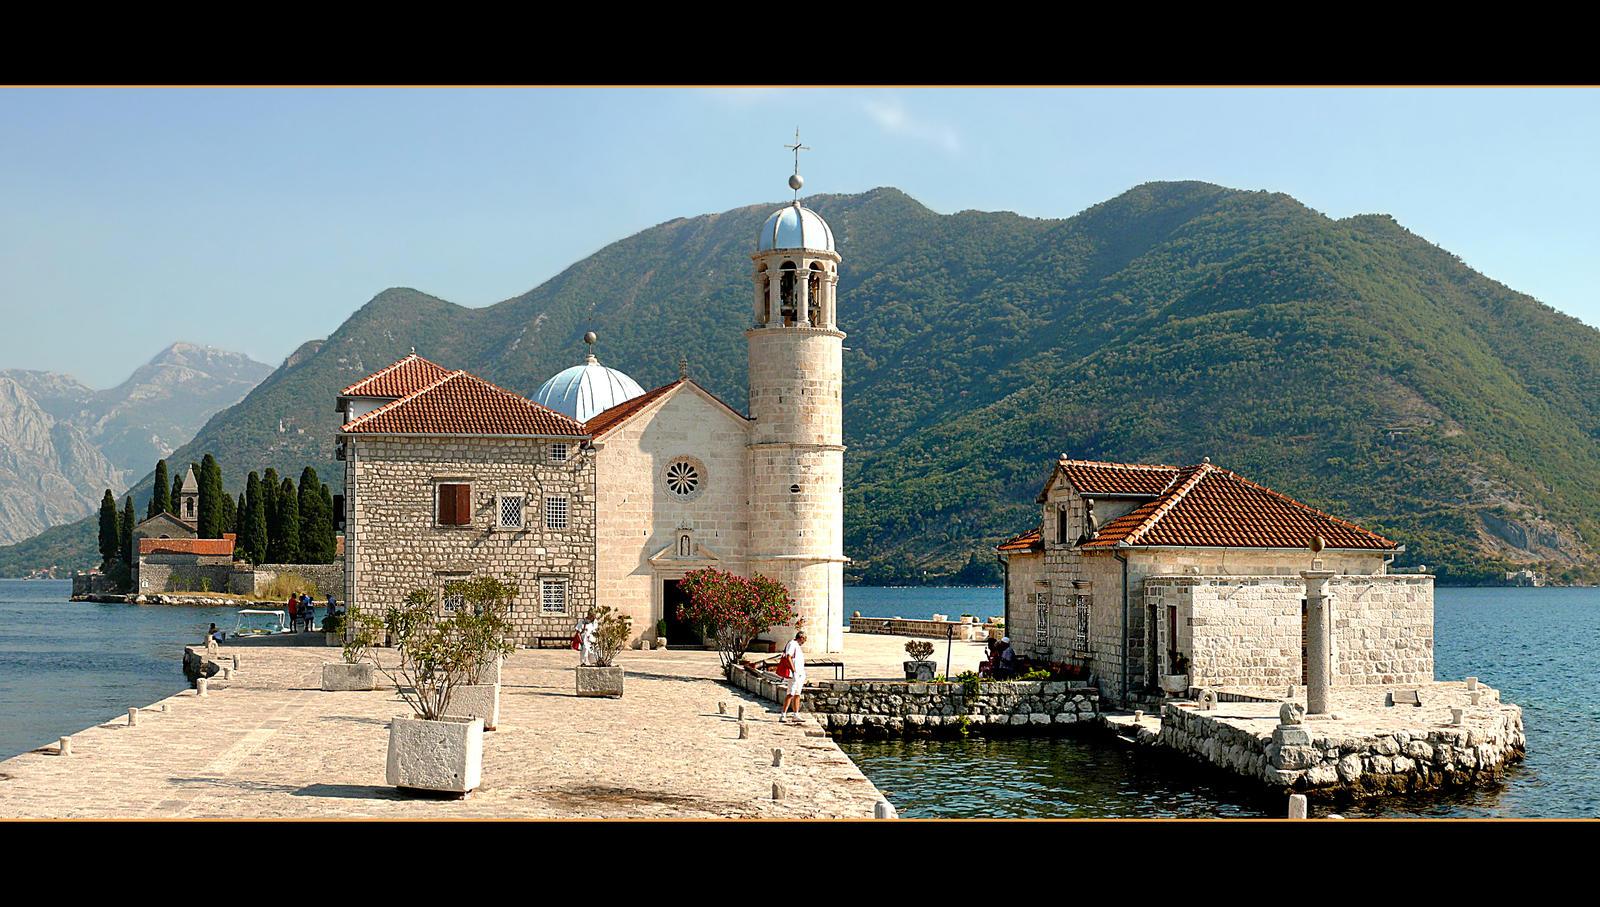 Church On Island On Kotor Bay by skarzynscy